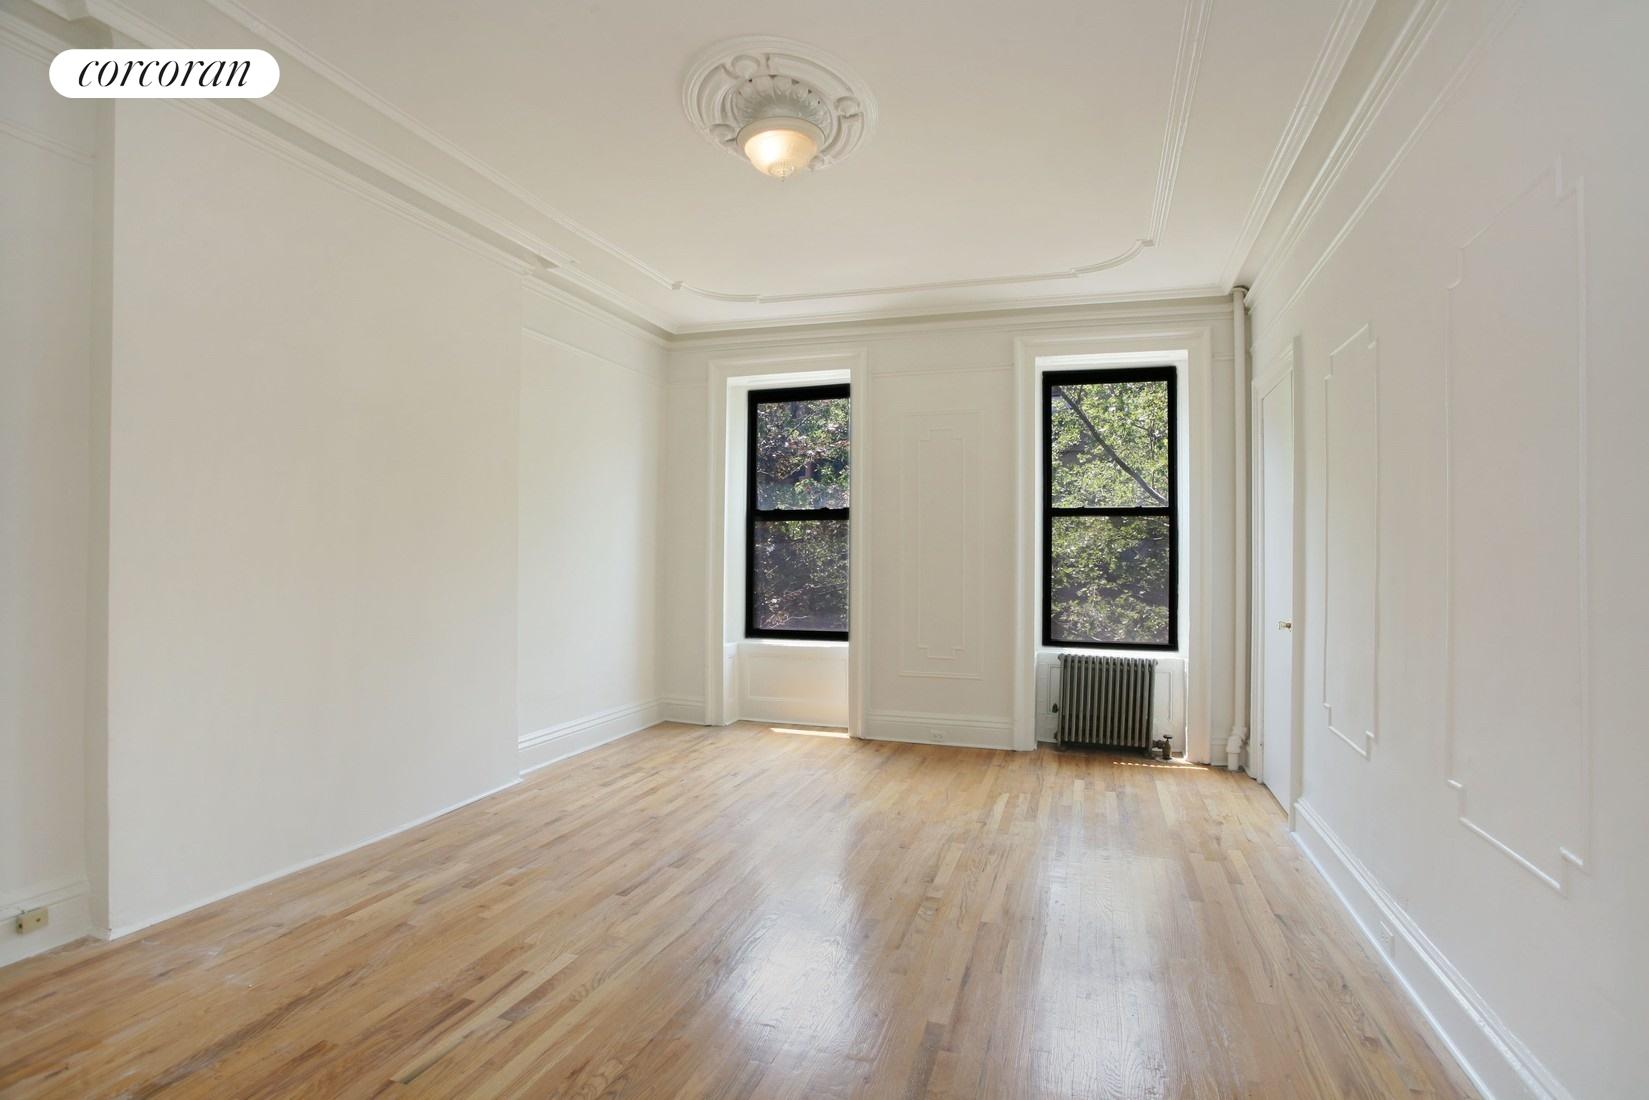 193 President Street, Apt 3, Brooklyn, New York 11231